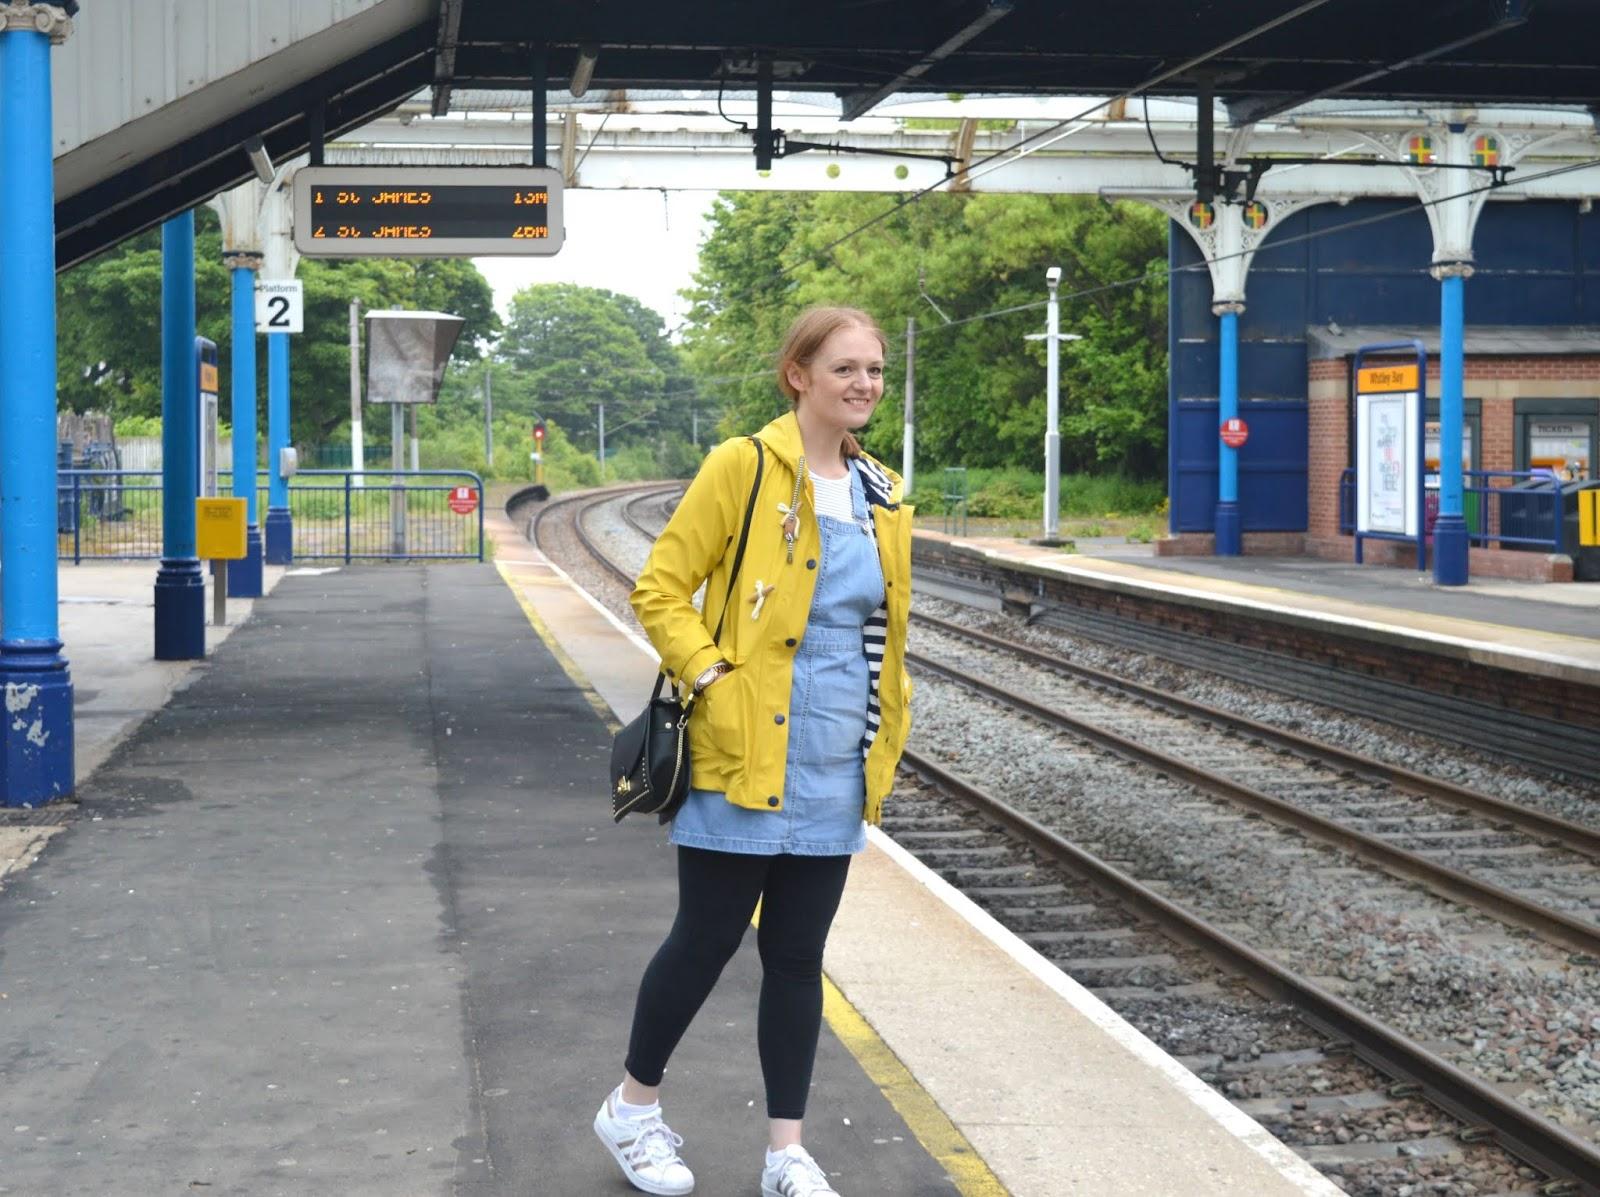 Walking North Tyneside with Tyne & Wear Metro